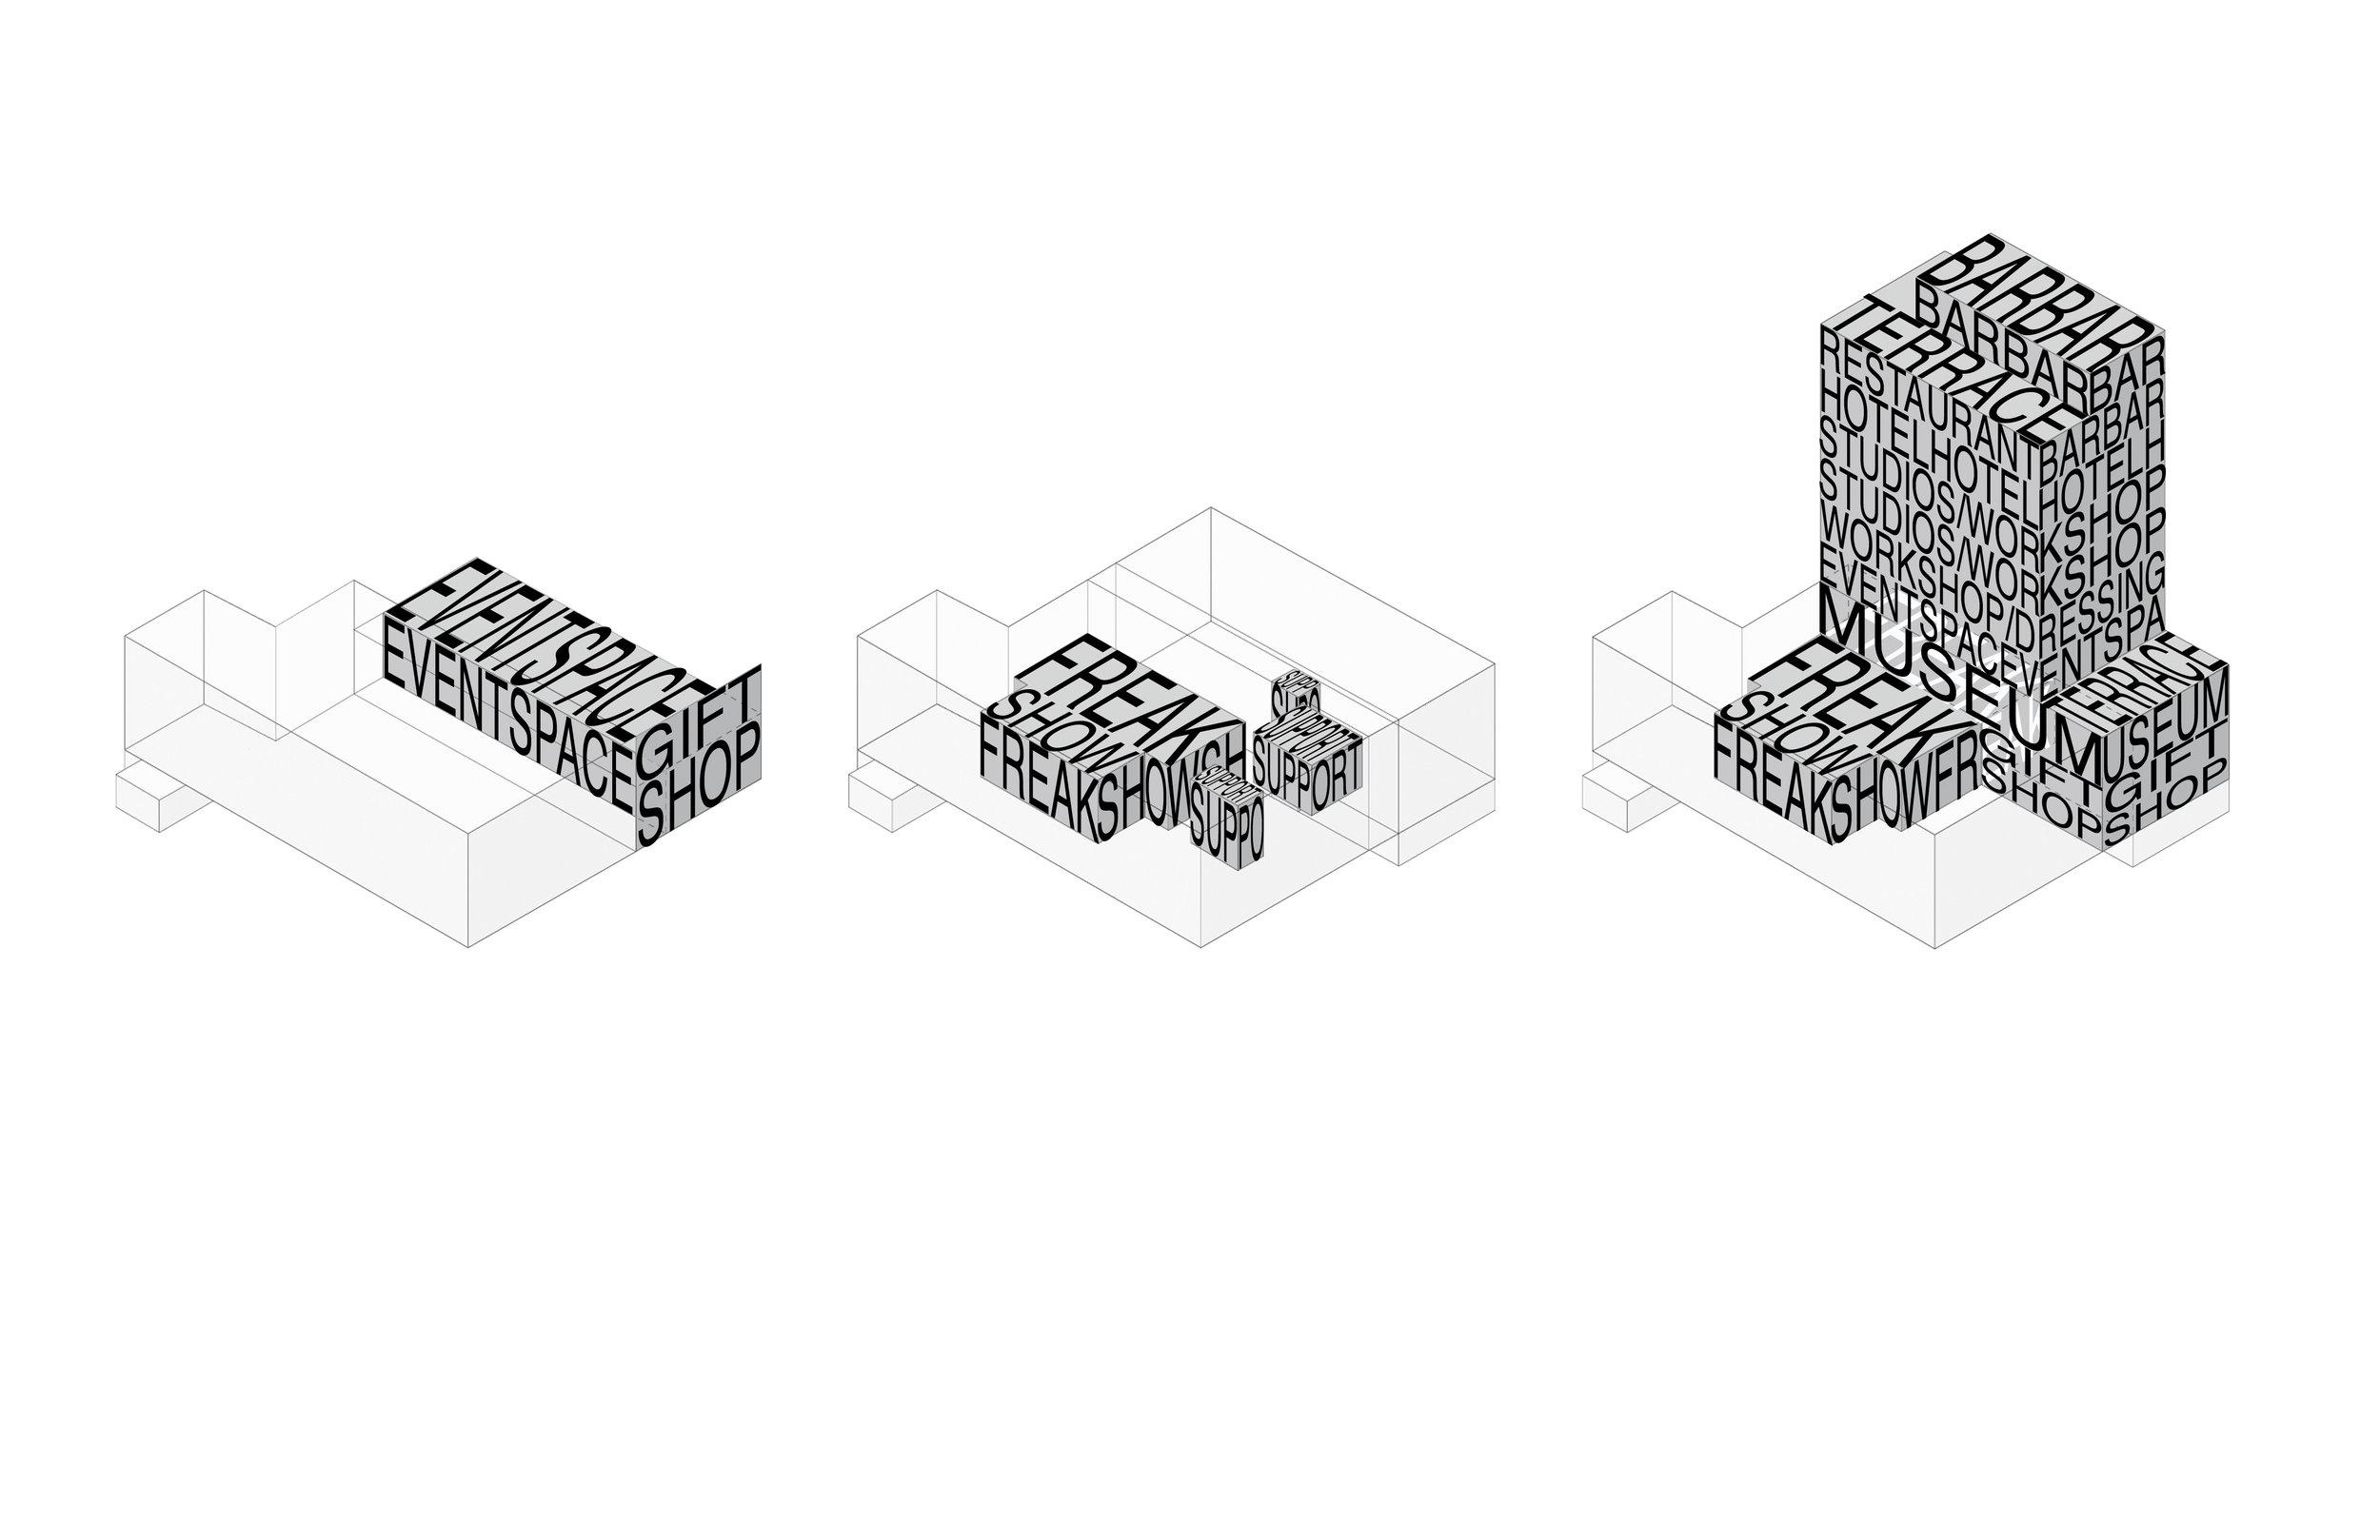 Phasing+Axon+Horizontal.jpg